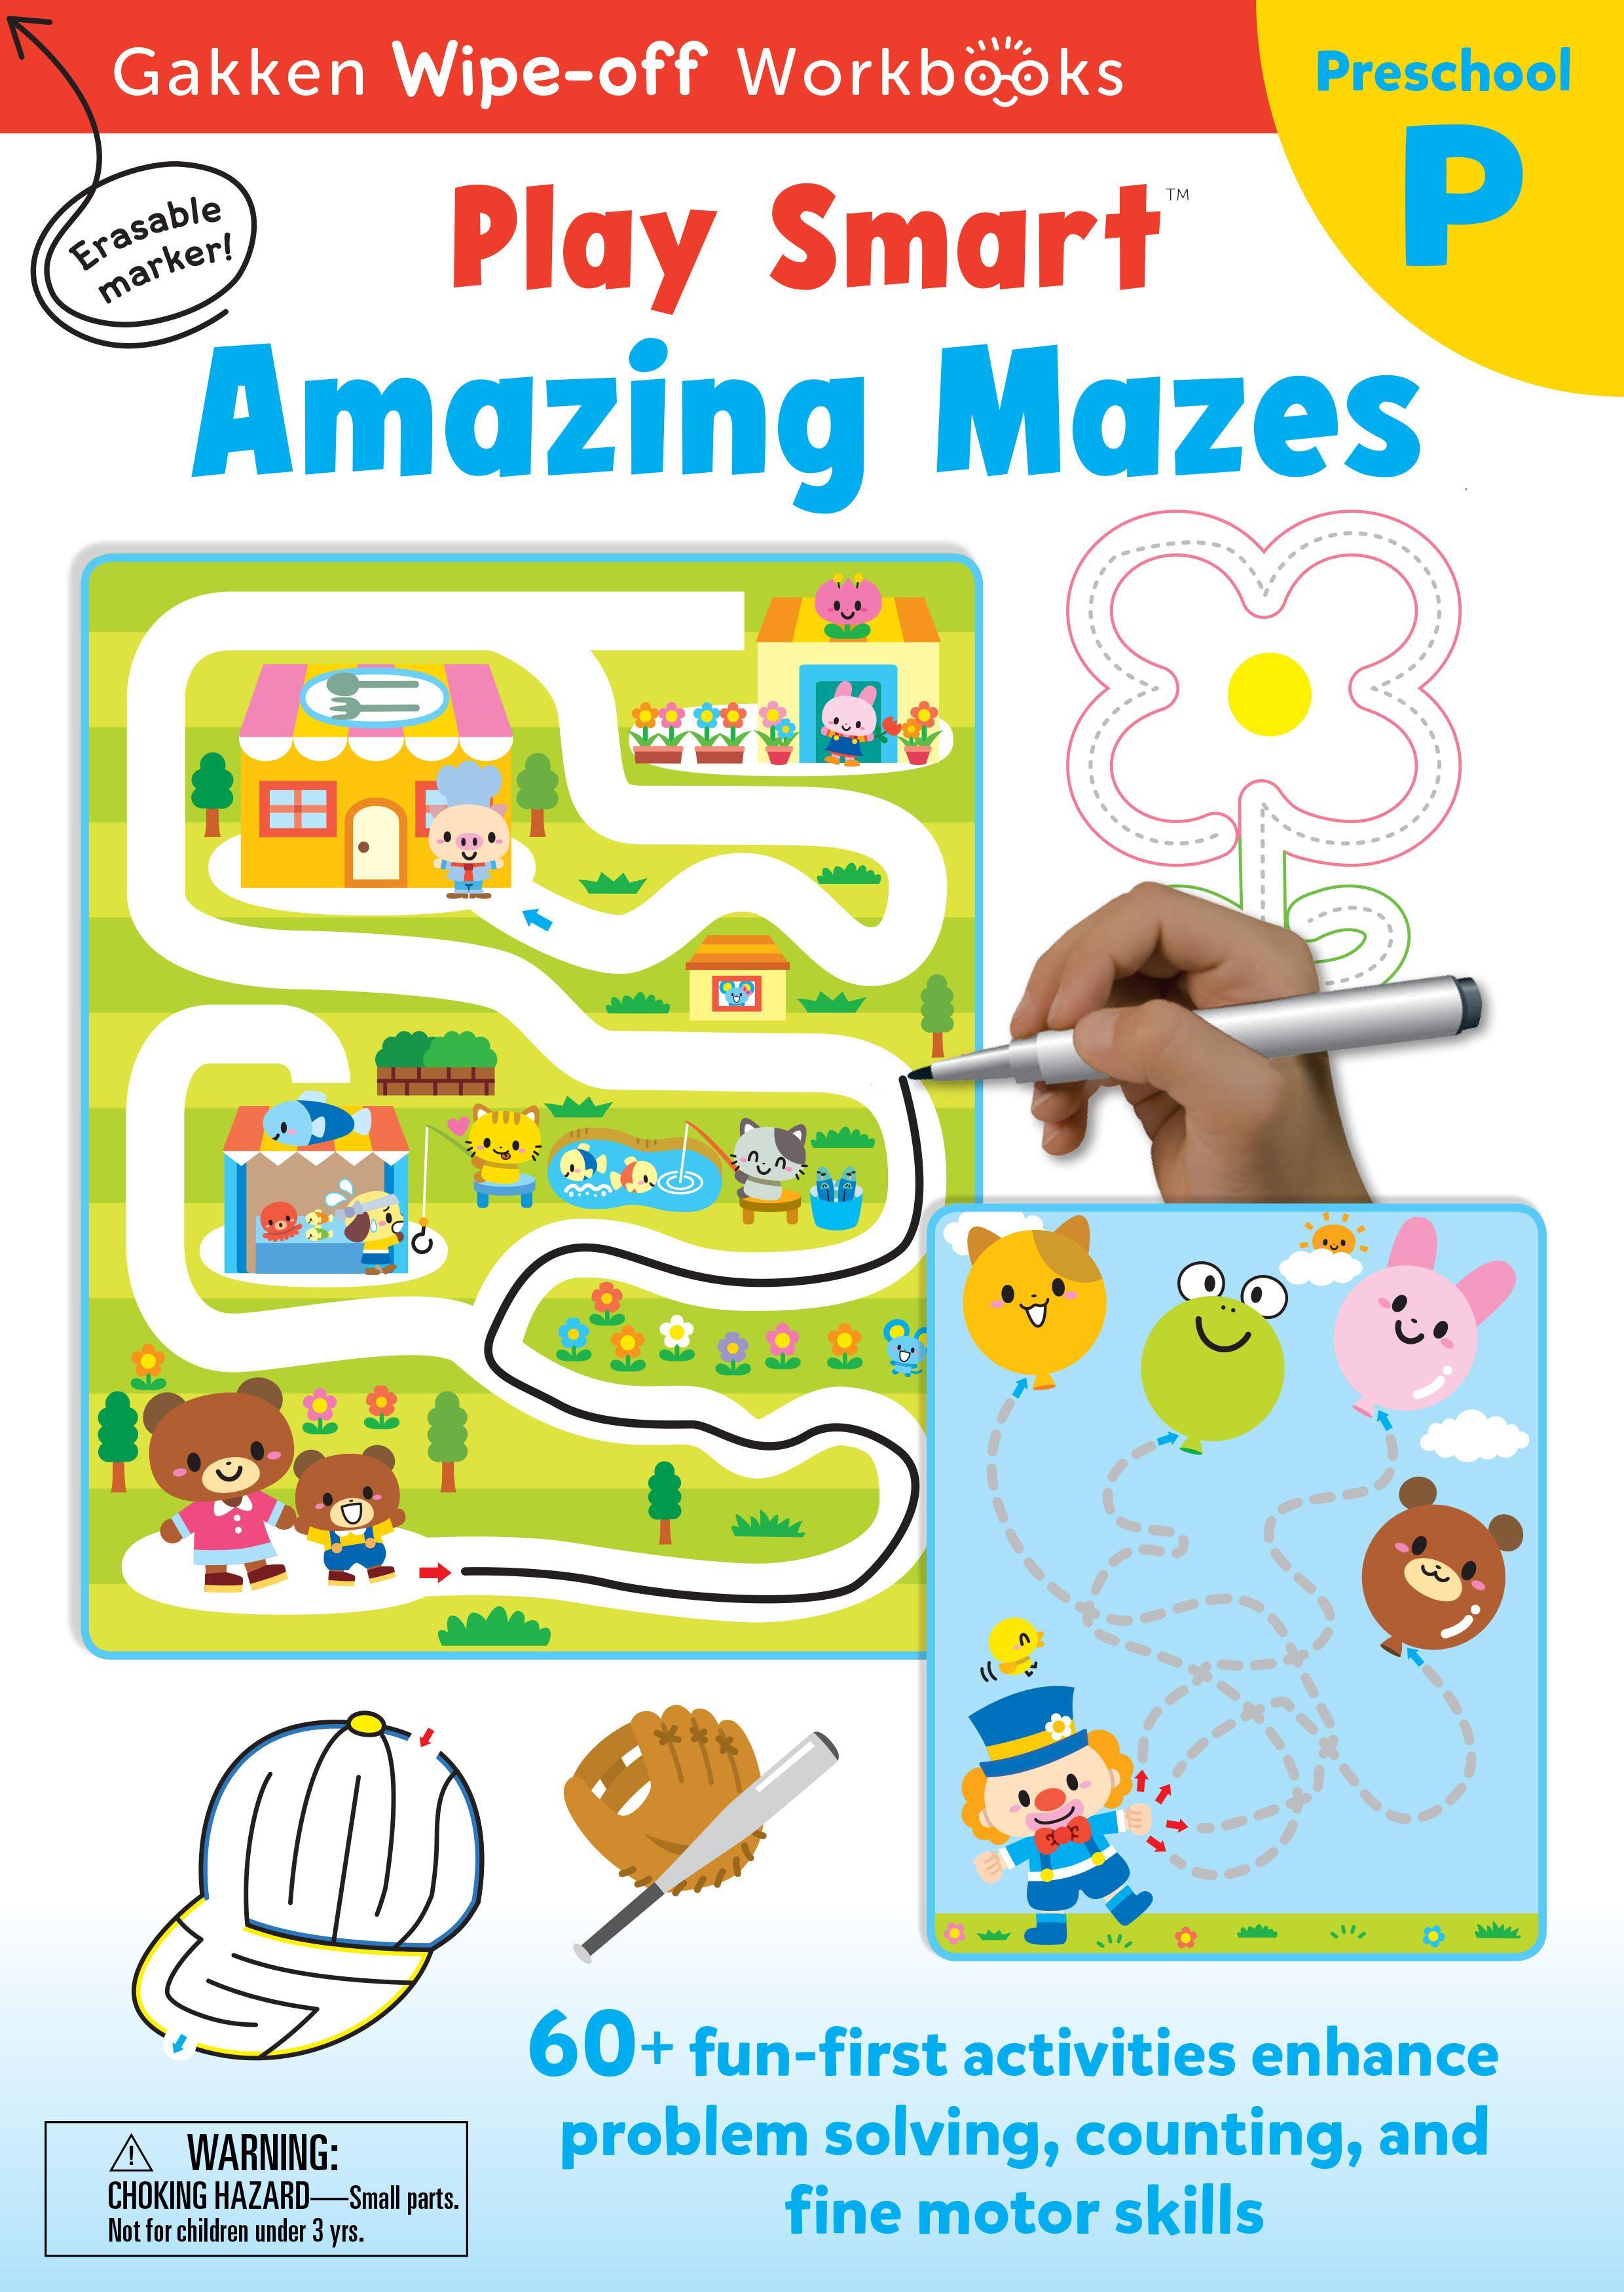 PlaySmart : Wipe&Off Amazing Mazes